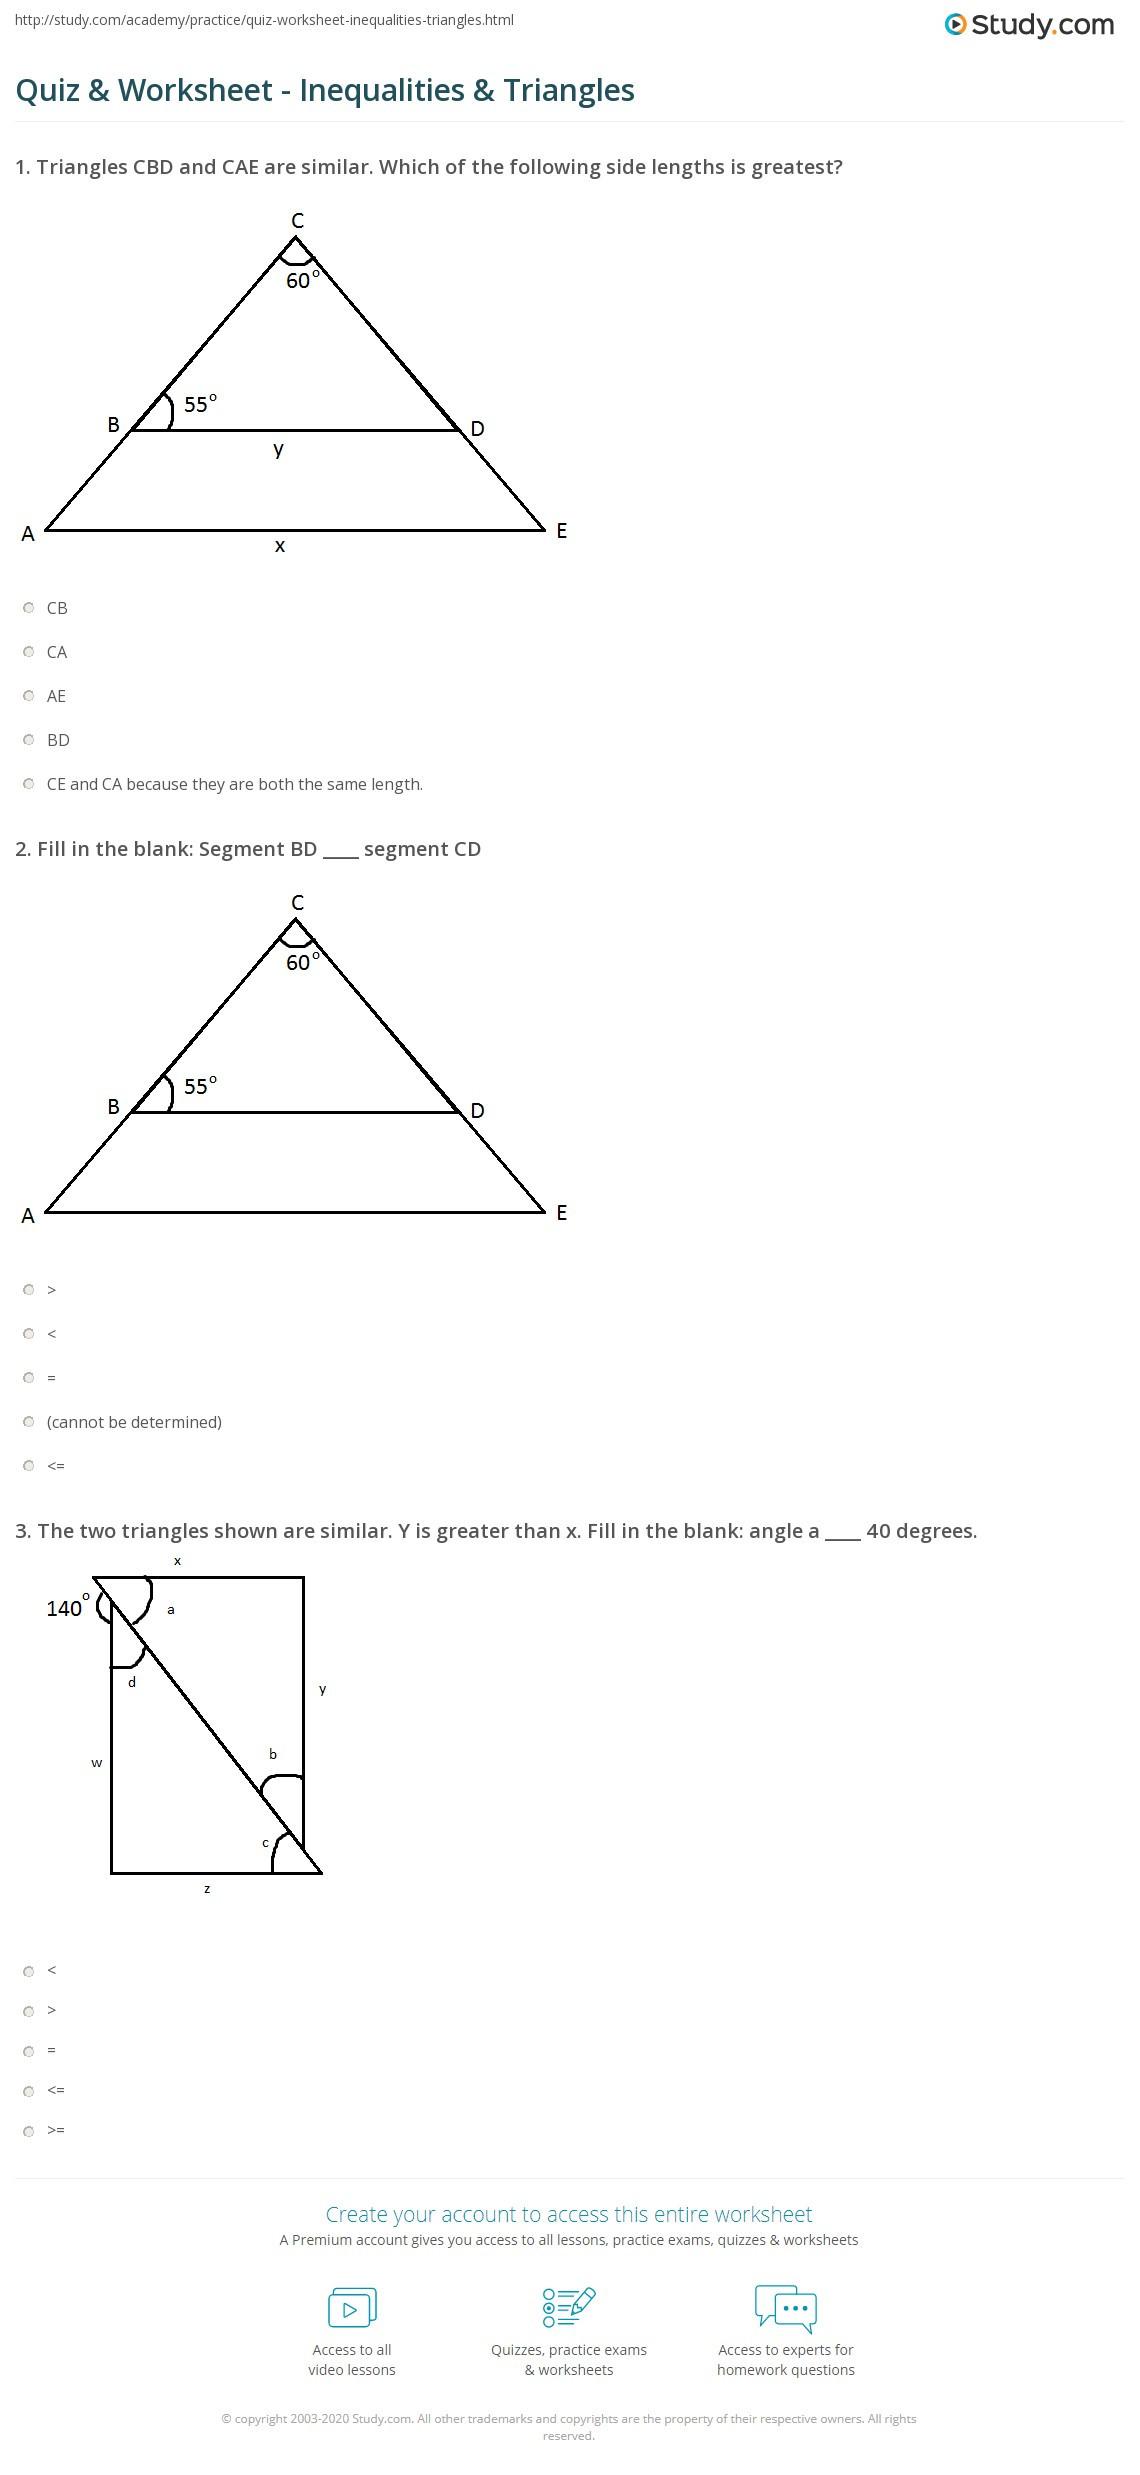 Triangle Inequality theorem Worksheet Quiz & Worksheet Inequalities & Triangles